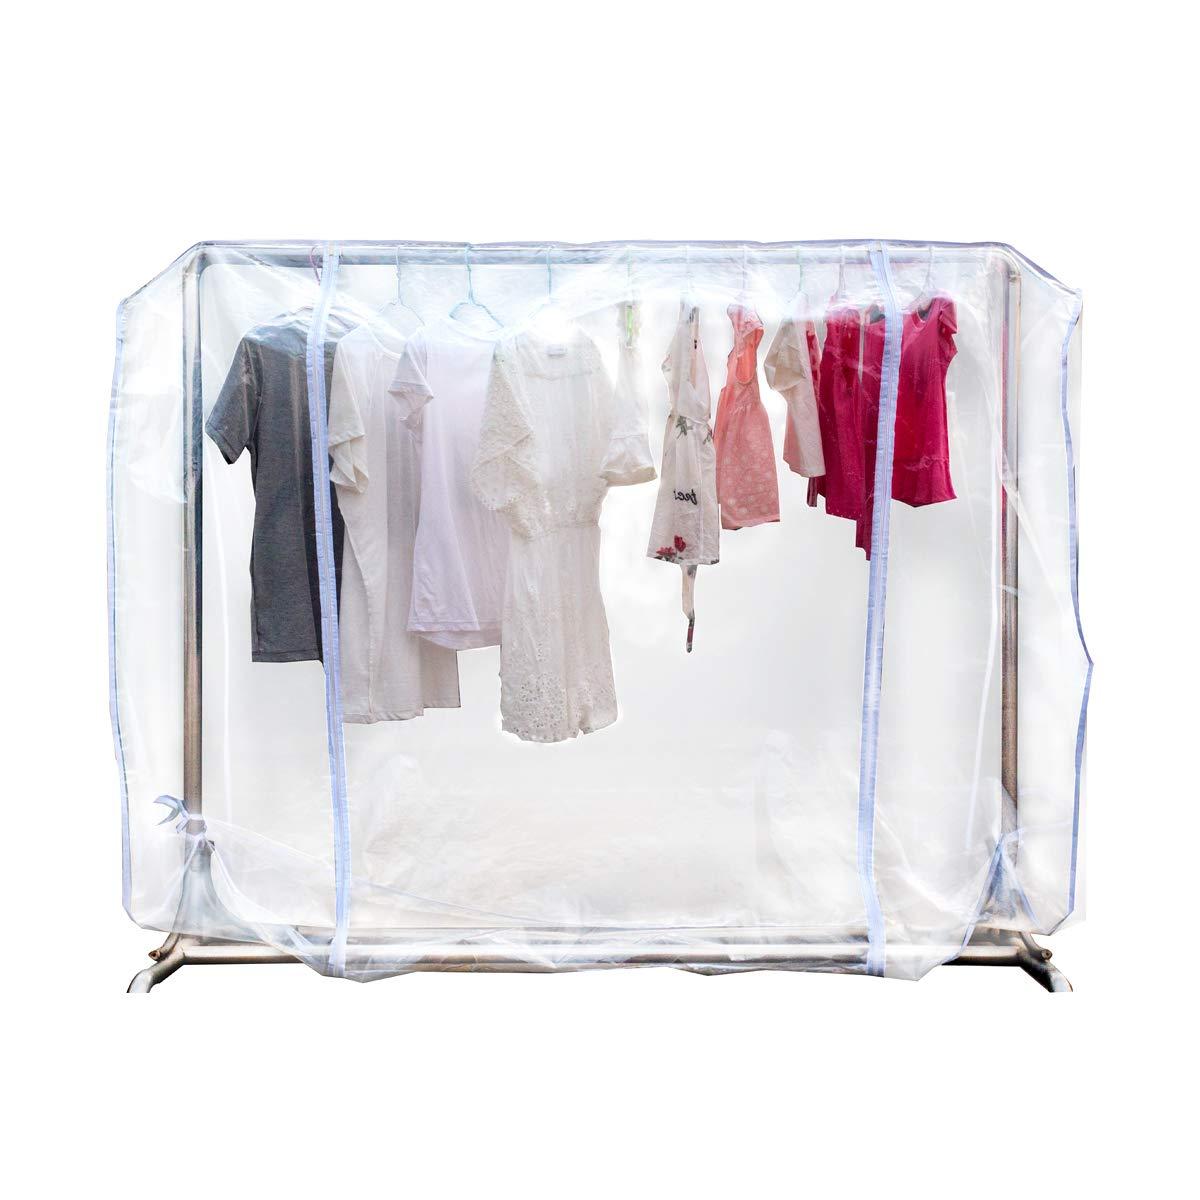 Amazon Com Zzone Garment Rack Cover Transparent Peva Clothing Rack